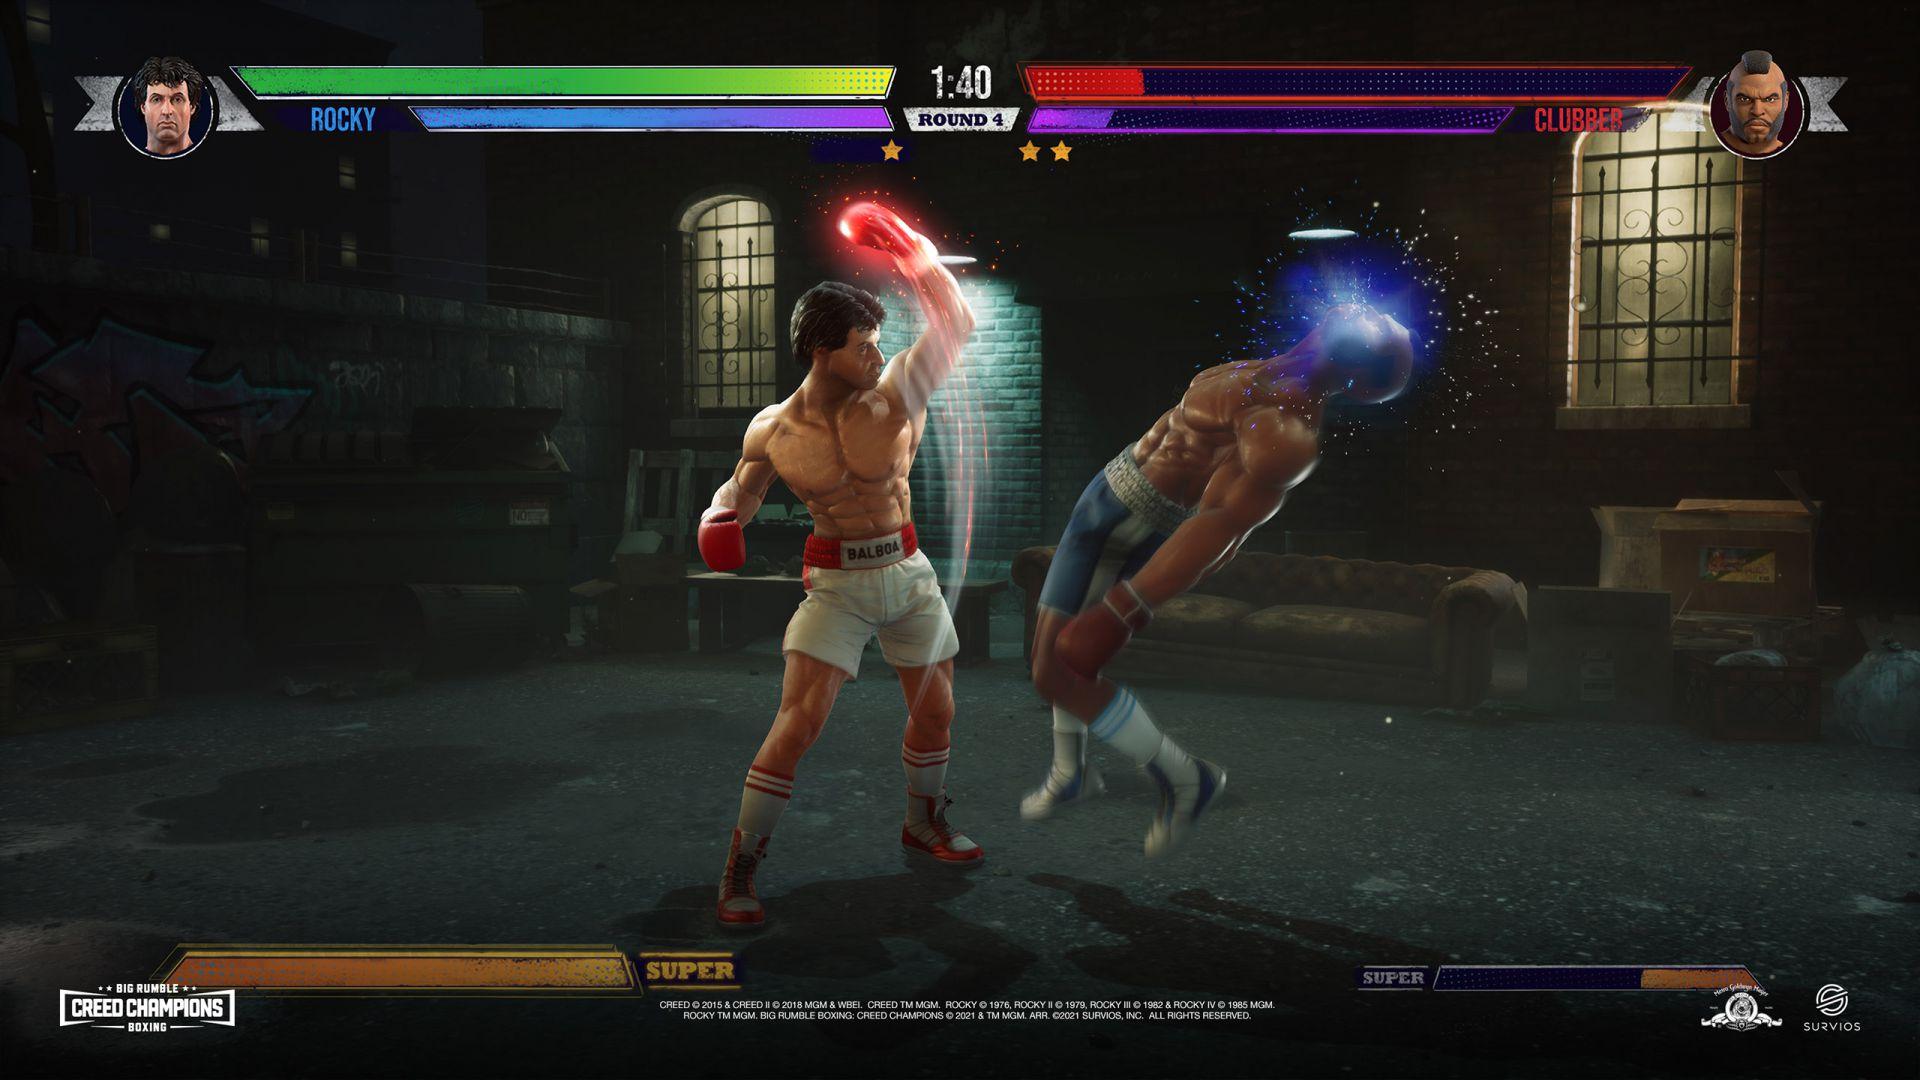 big rumble boxing creed champions 7 - generacion xbox